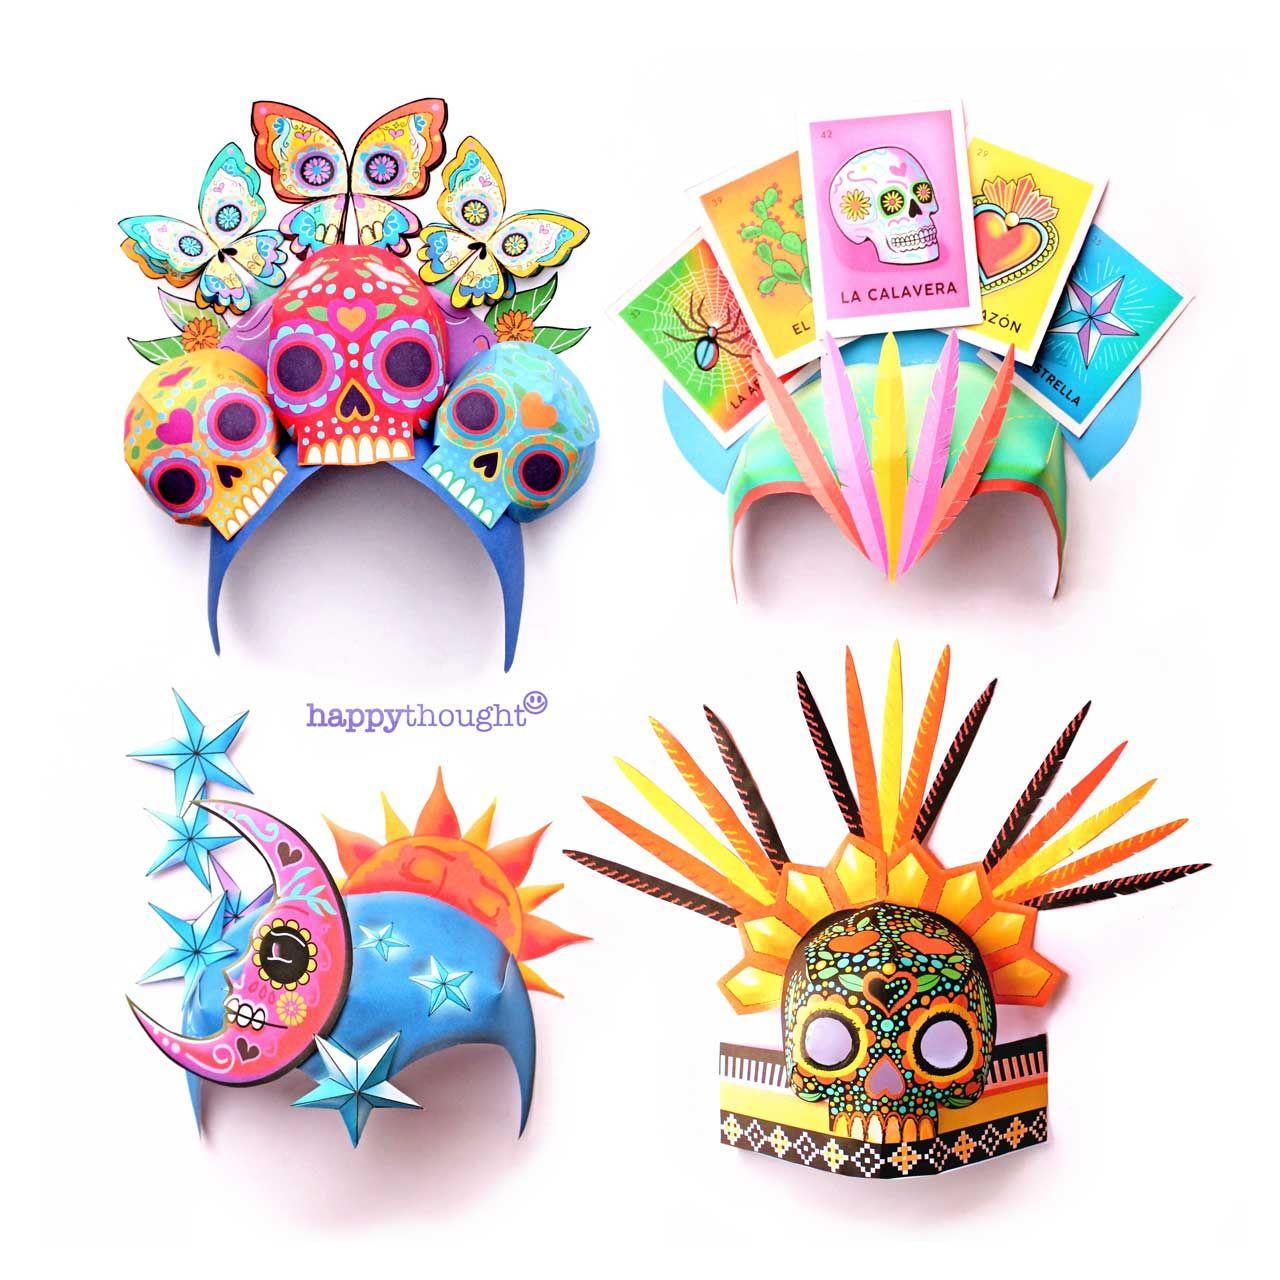 Printable Festival Headpiece Template Easy And Fun To Make Diy